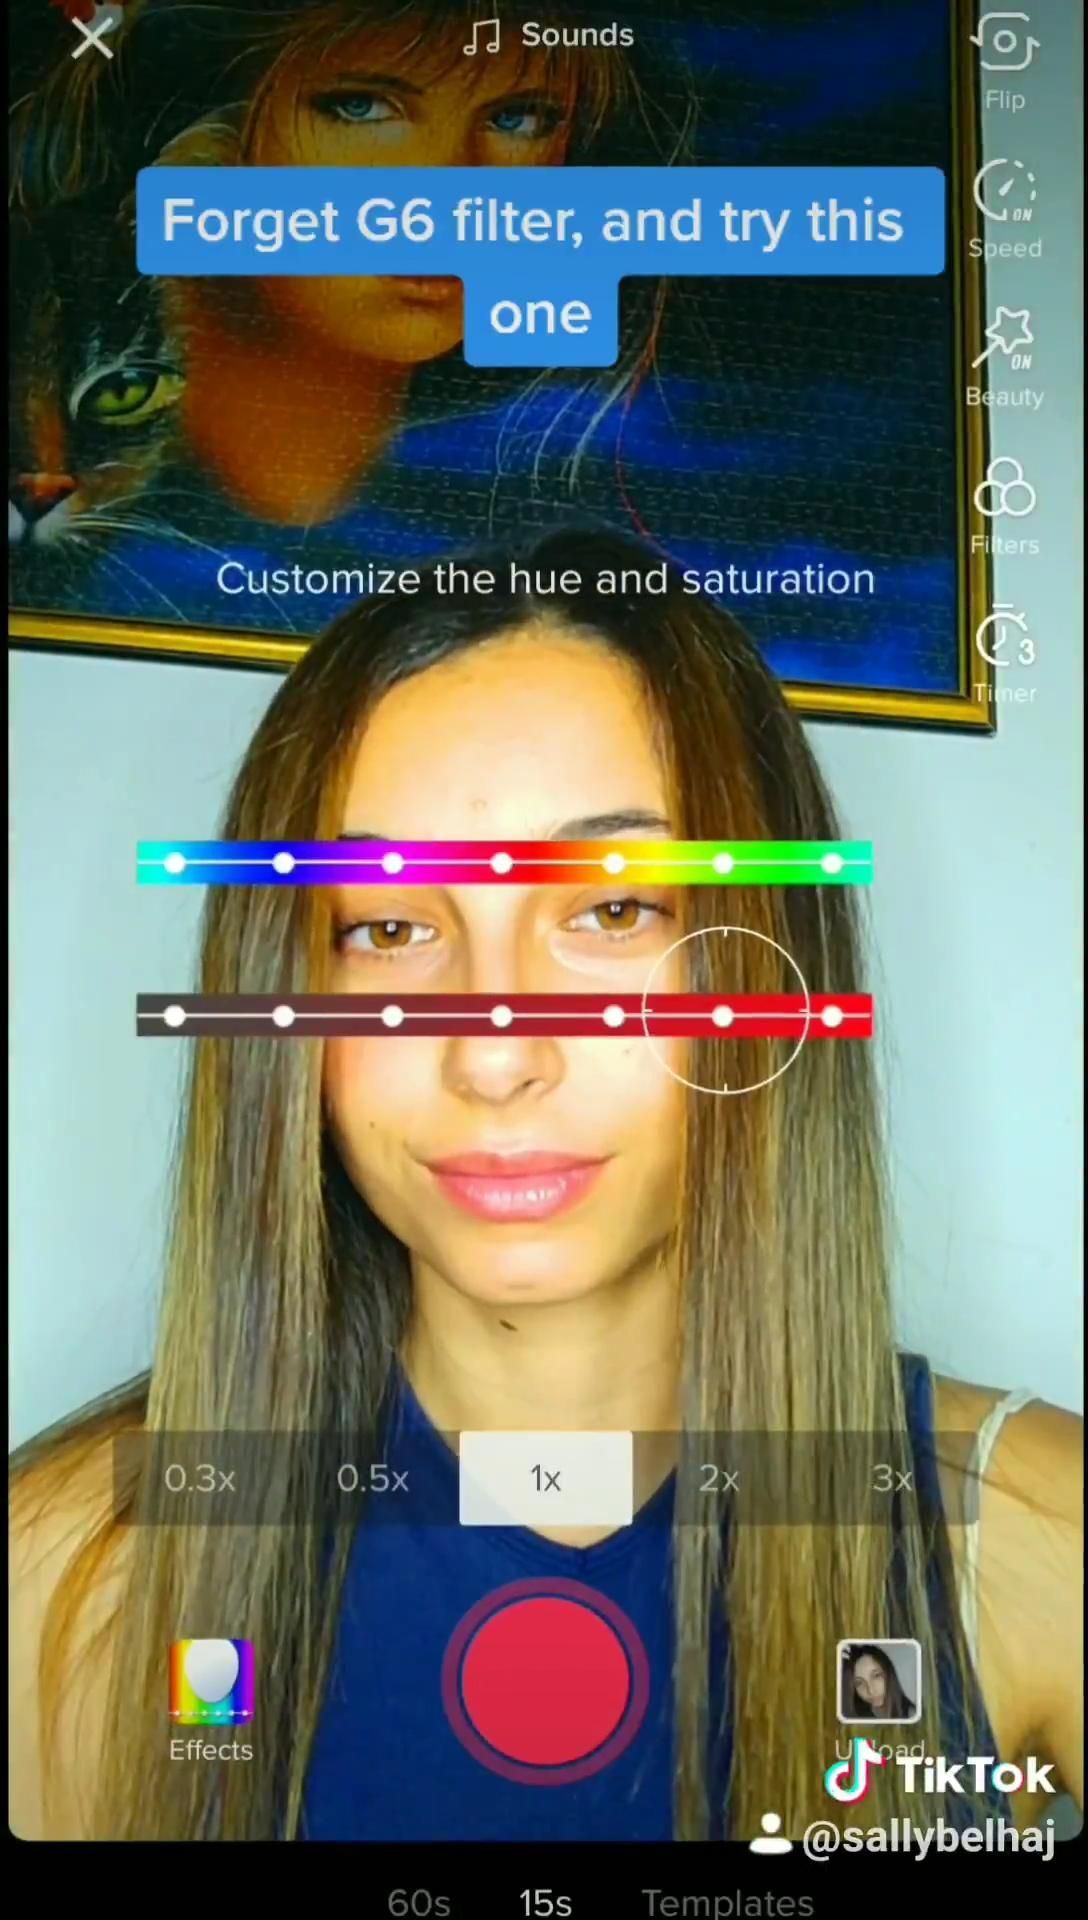 Tiktok Color Customizer Tutorial Video Photo Editing Photo Editing Techniques Photo Manipulation